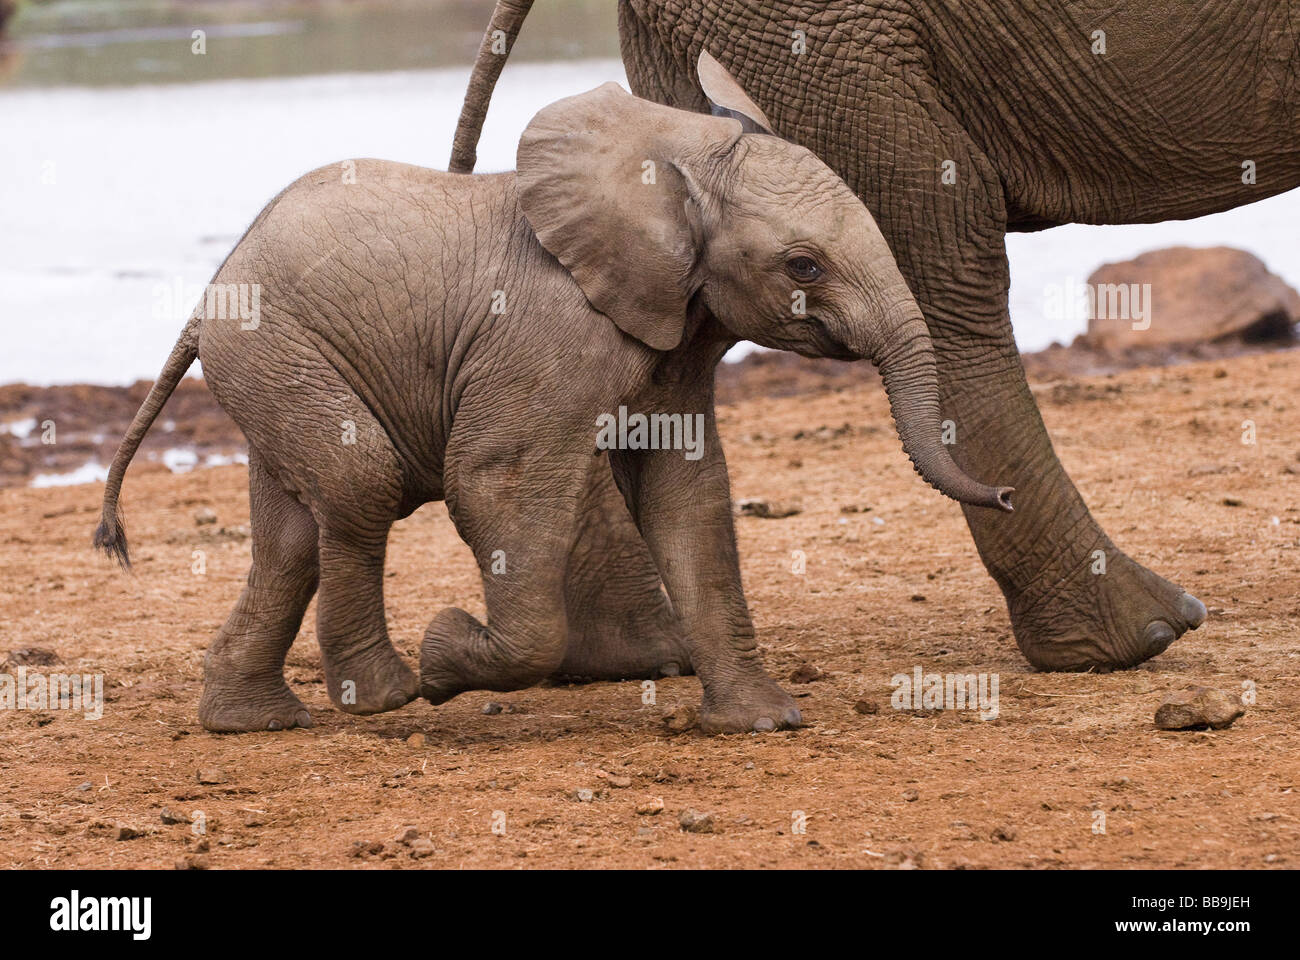 Jeune africain bébé éléphant Loxodonta africana L'ARCHE ABERDARE NATIONAL PARK Kenya Afrique Photo Stock